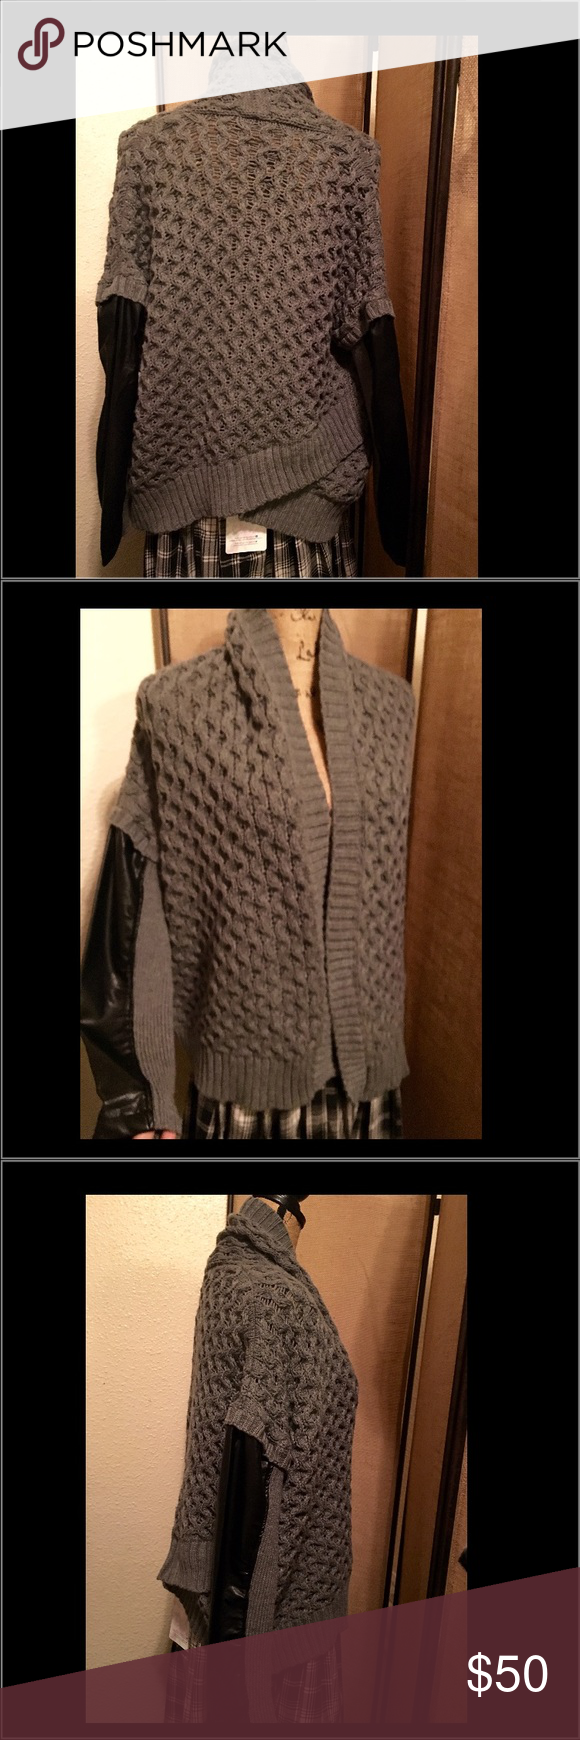 725d2a1f5 Dex Grey and Black Faux Leather Sleeve Cardigan NWT